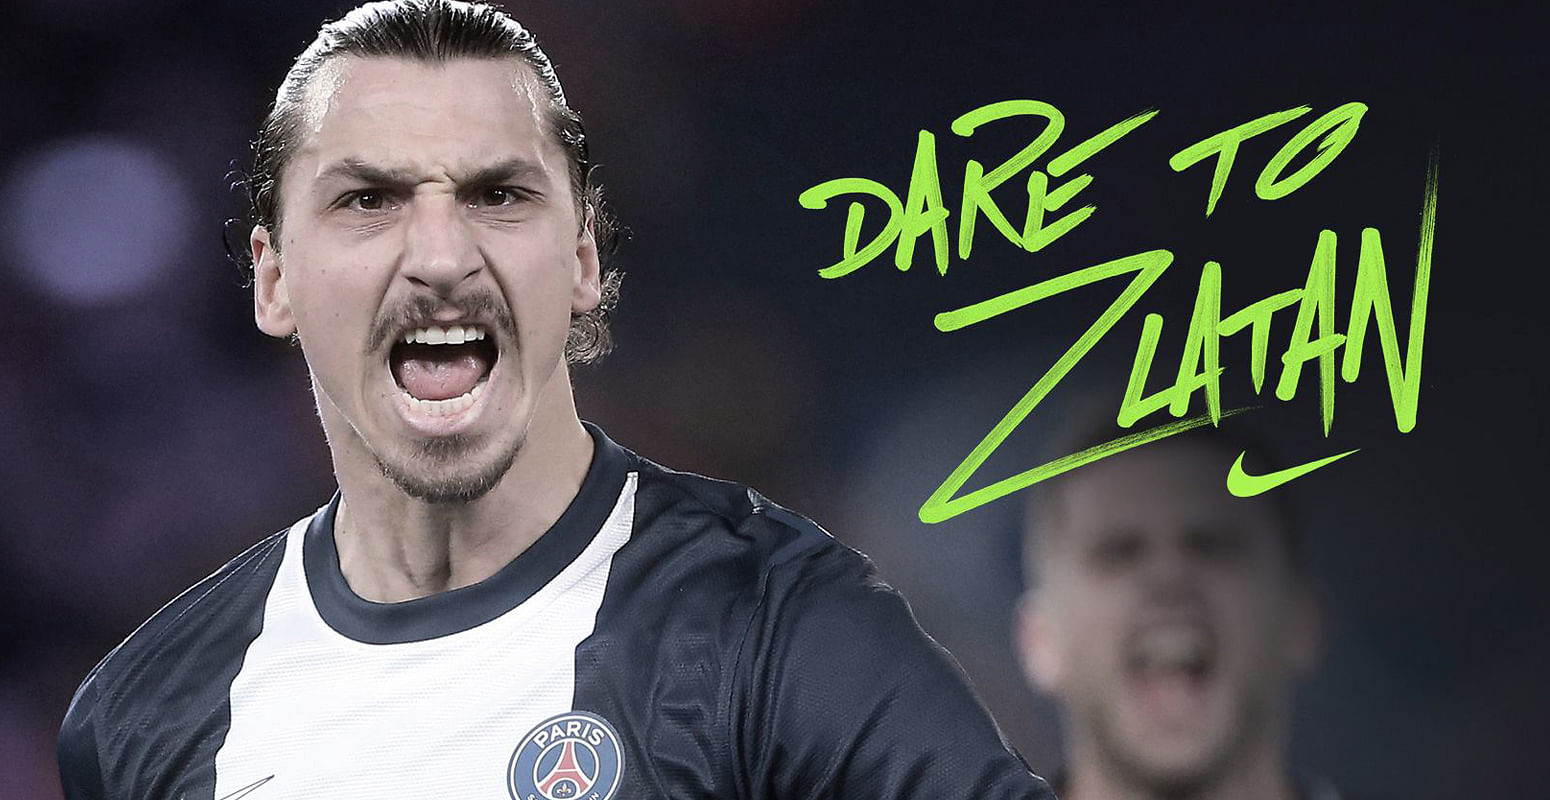 [Humour] 8 things Zlatan Ibrahimovic would do if he was FIFA president